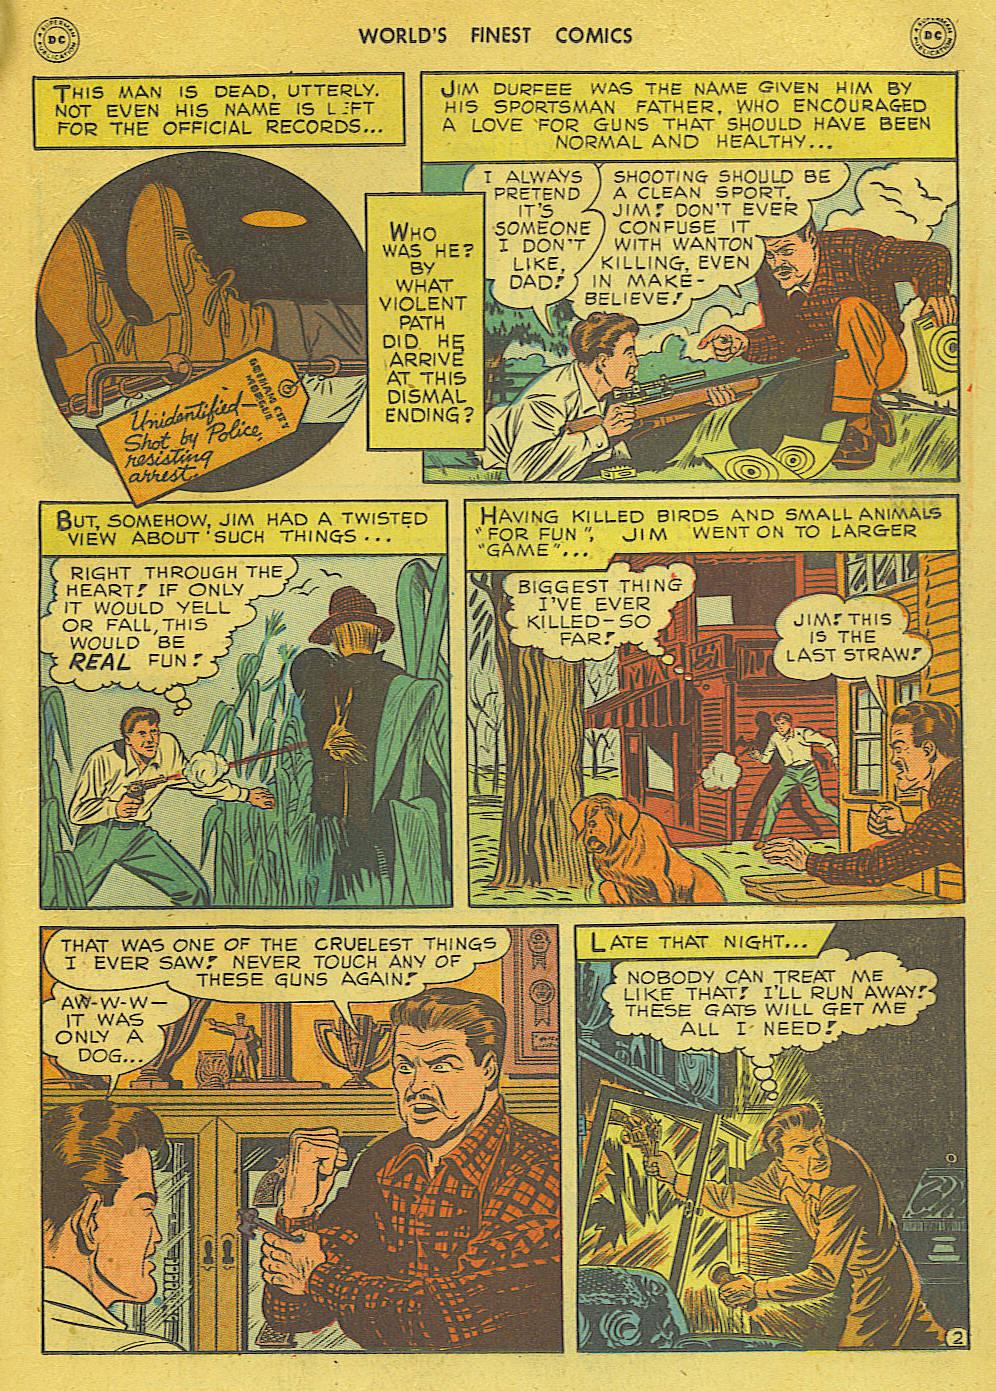 Read online World's Finest Comics comic -  Issue #34 - 63